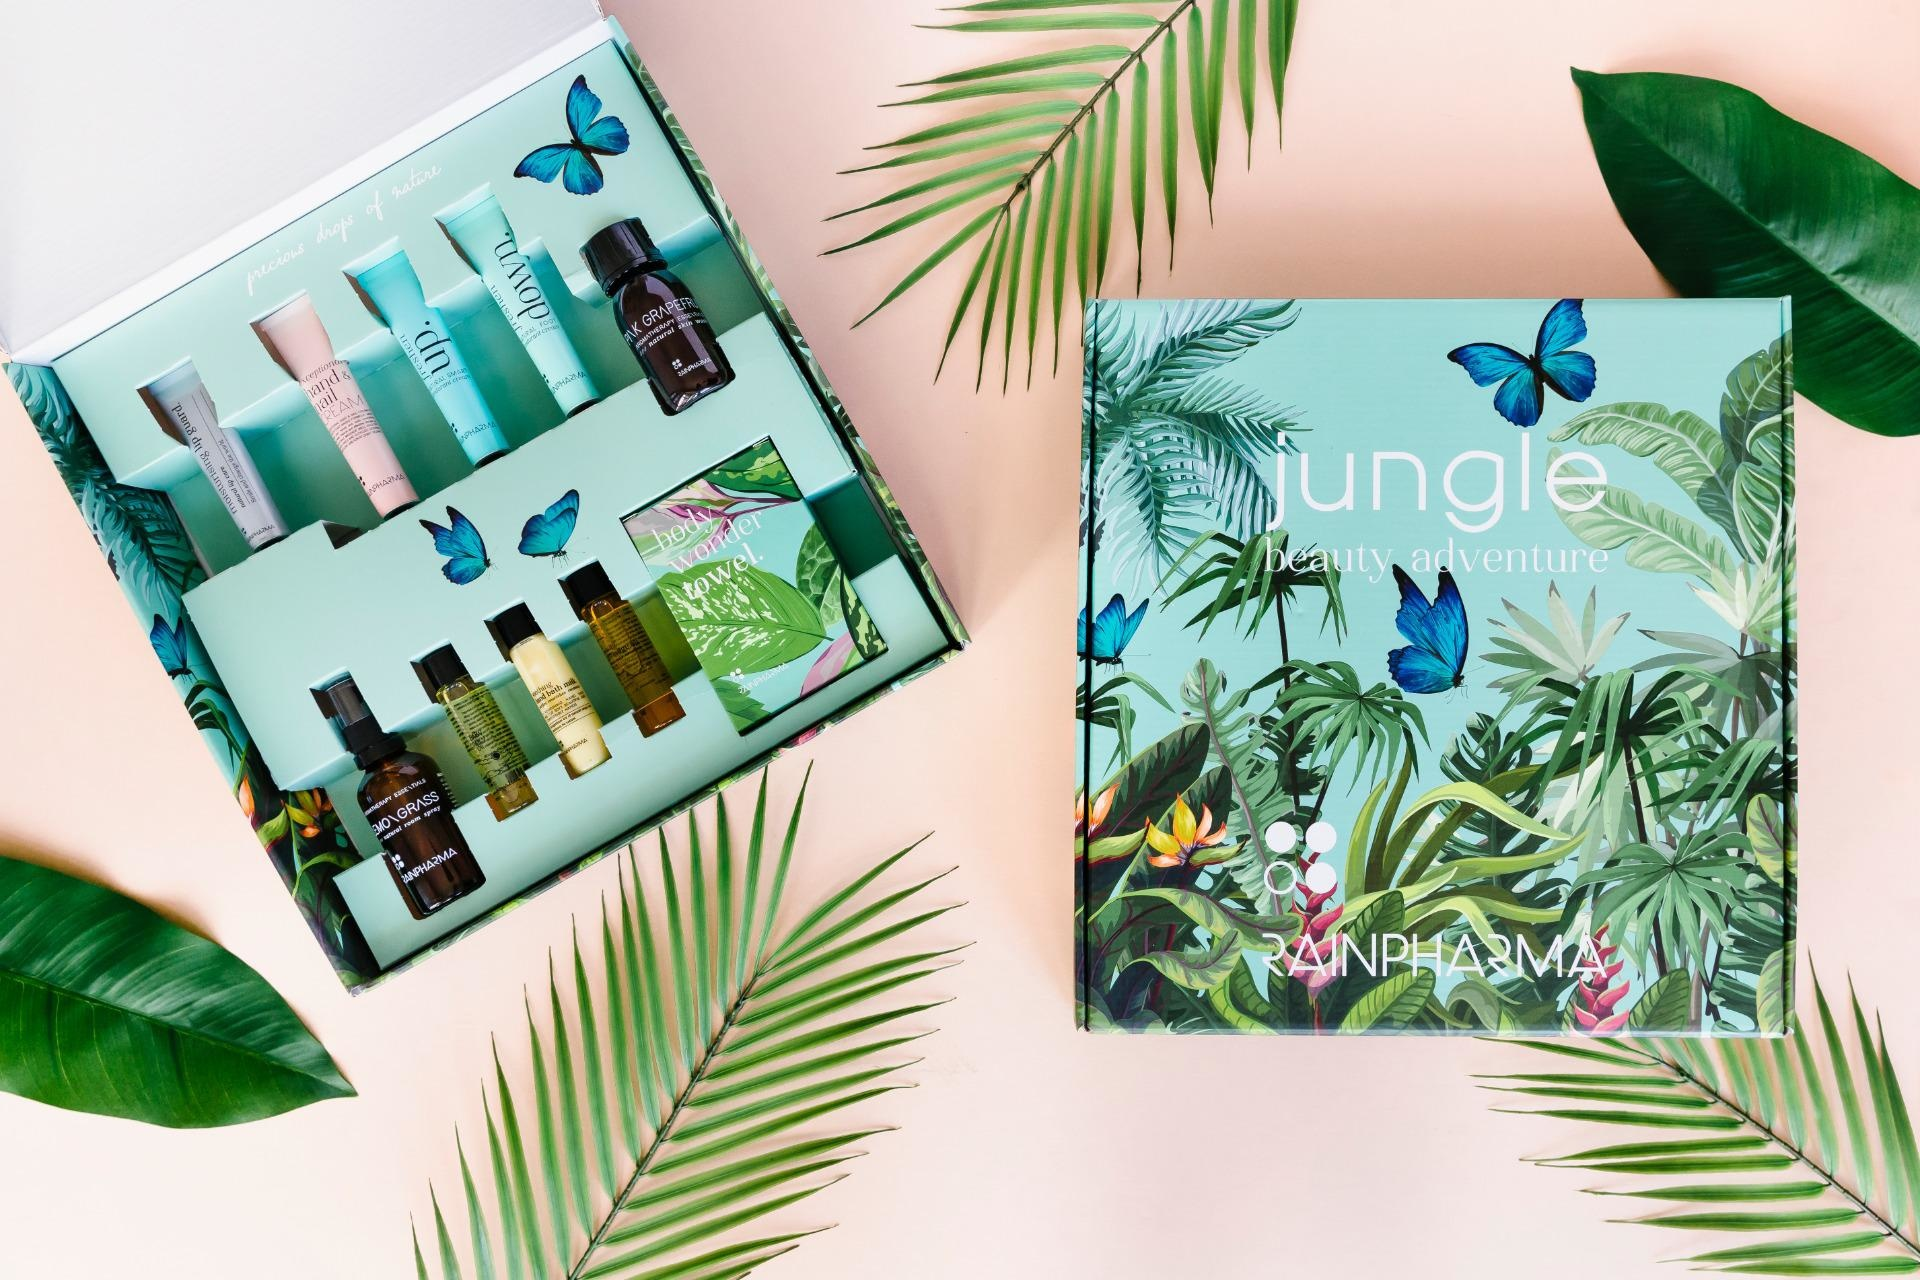 Jungle Beauty Adventure Box-6